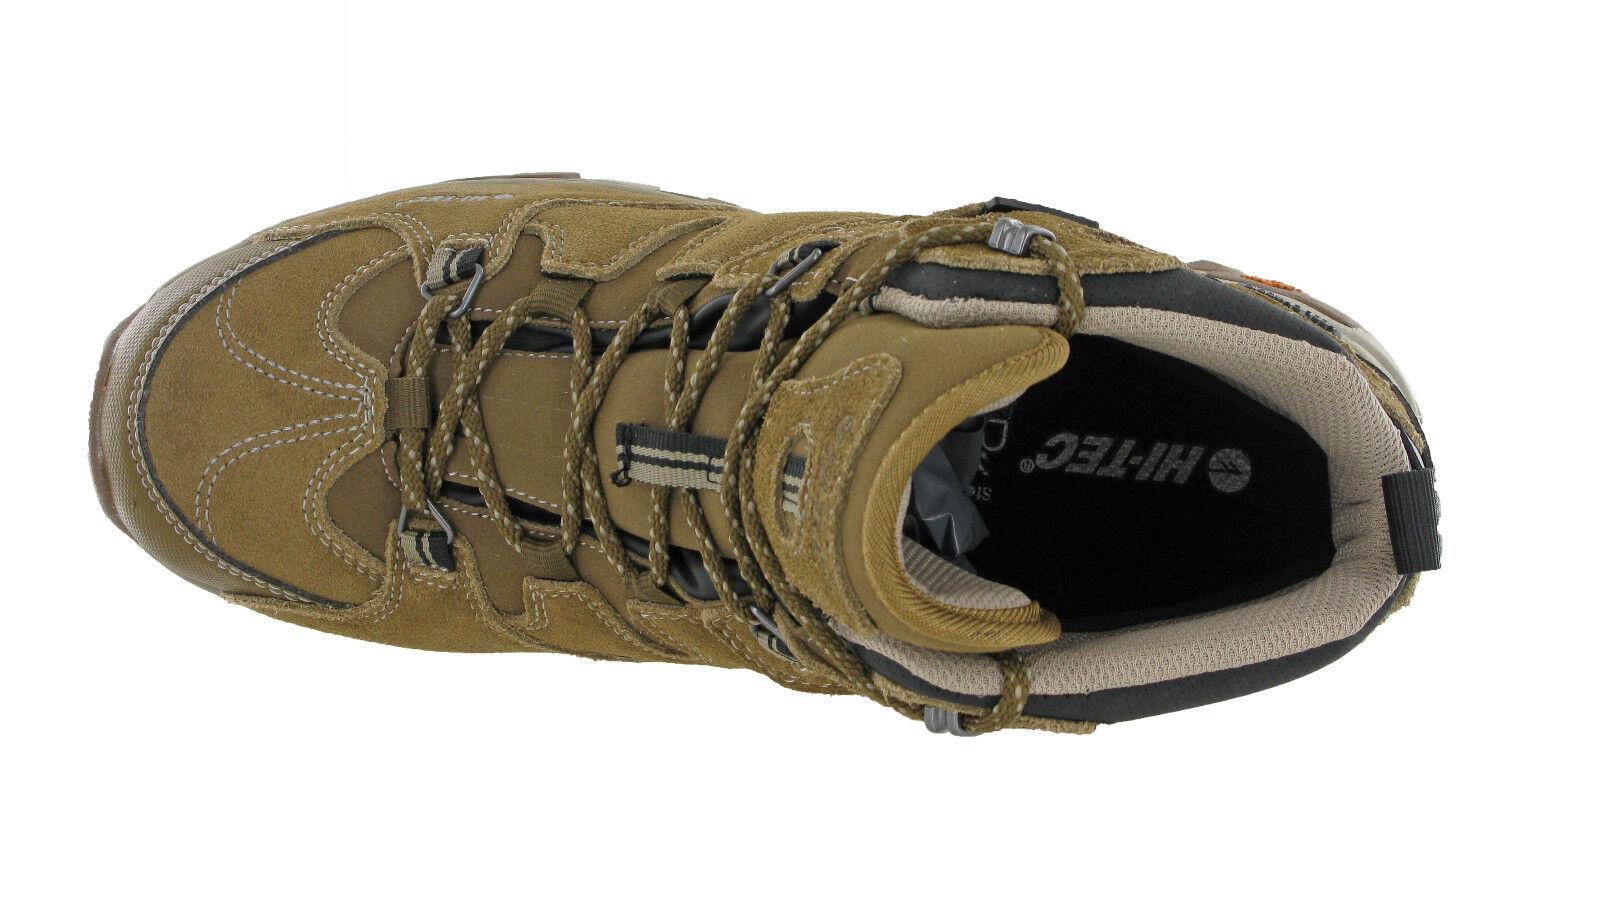 Hi-Tec ravus avventura Mid Scarpe da Ginnastica Impermeabili Da Da Da Passeggio Comfort Escursioni UK7-13 8a436e